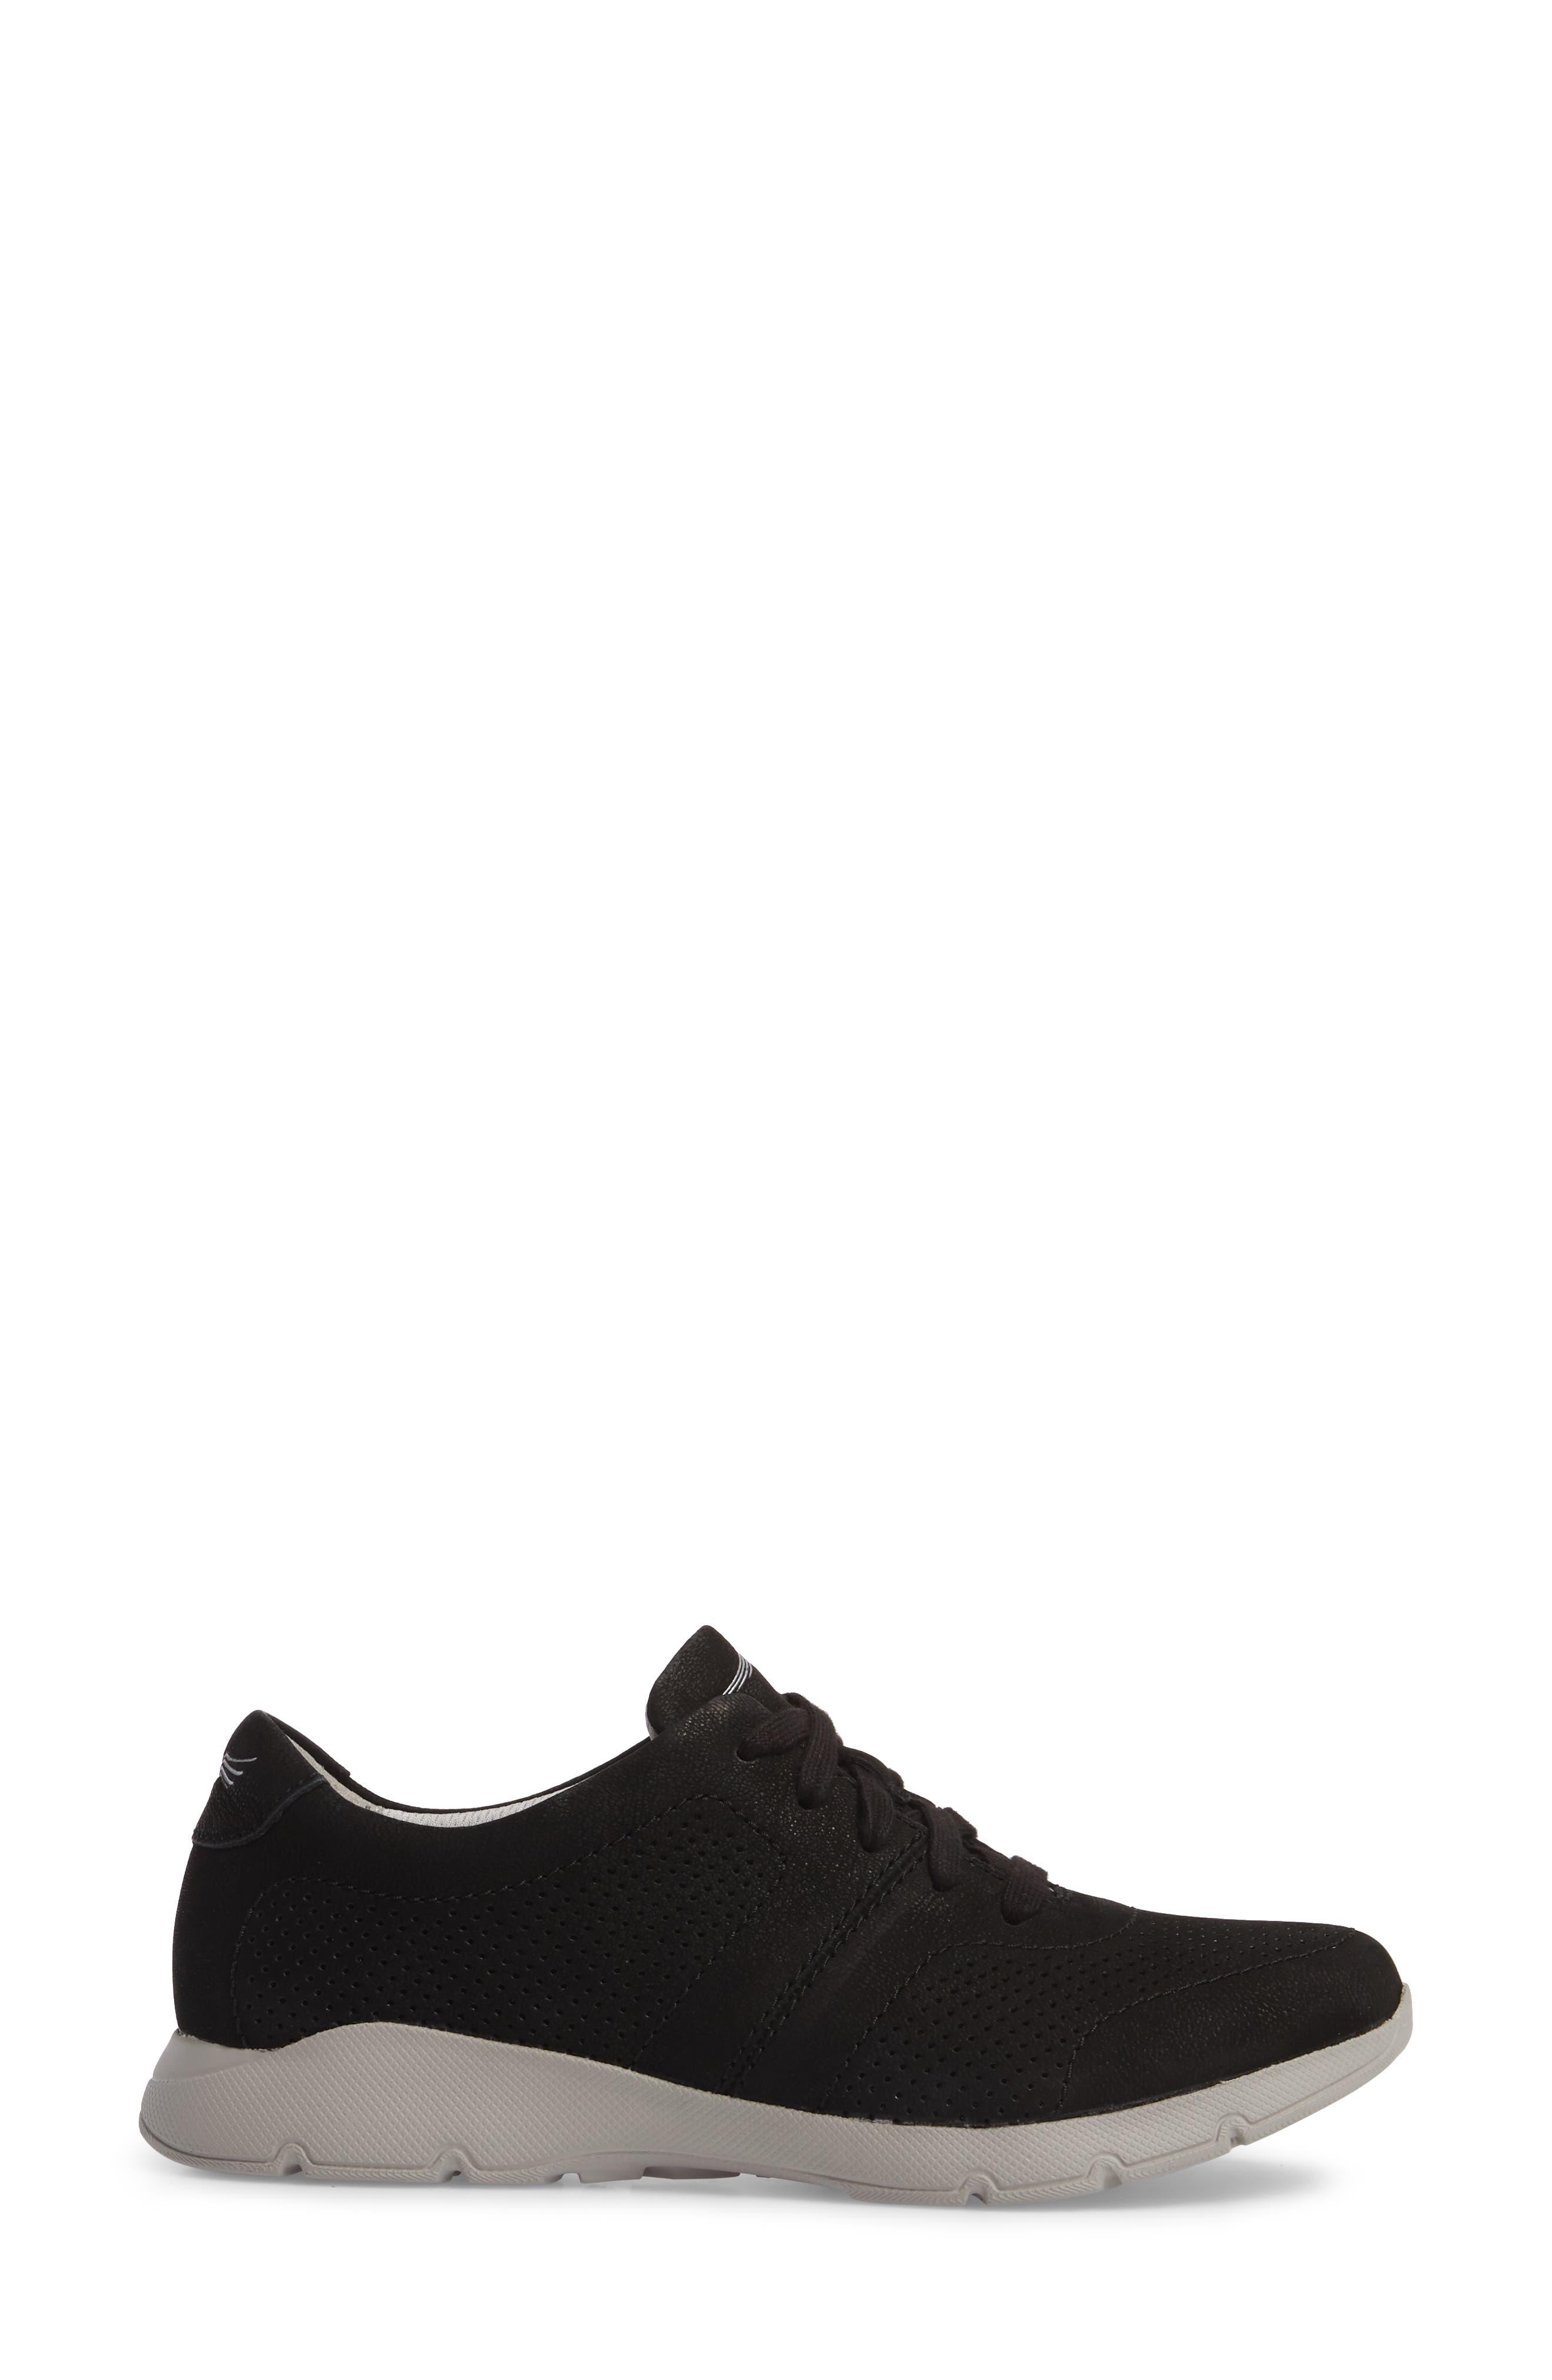 Alissa Sneaker,                             Alternate thumbnail 3, color,                             BLACK MILLED NUBUCK LEATHER